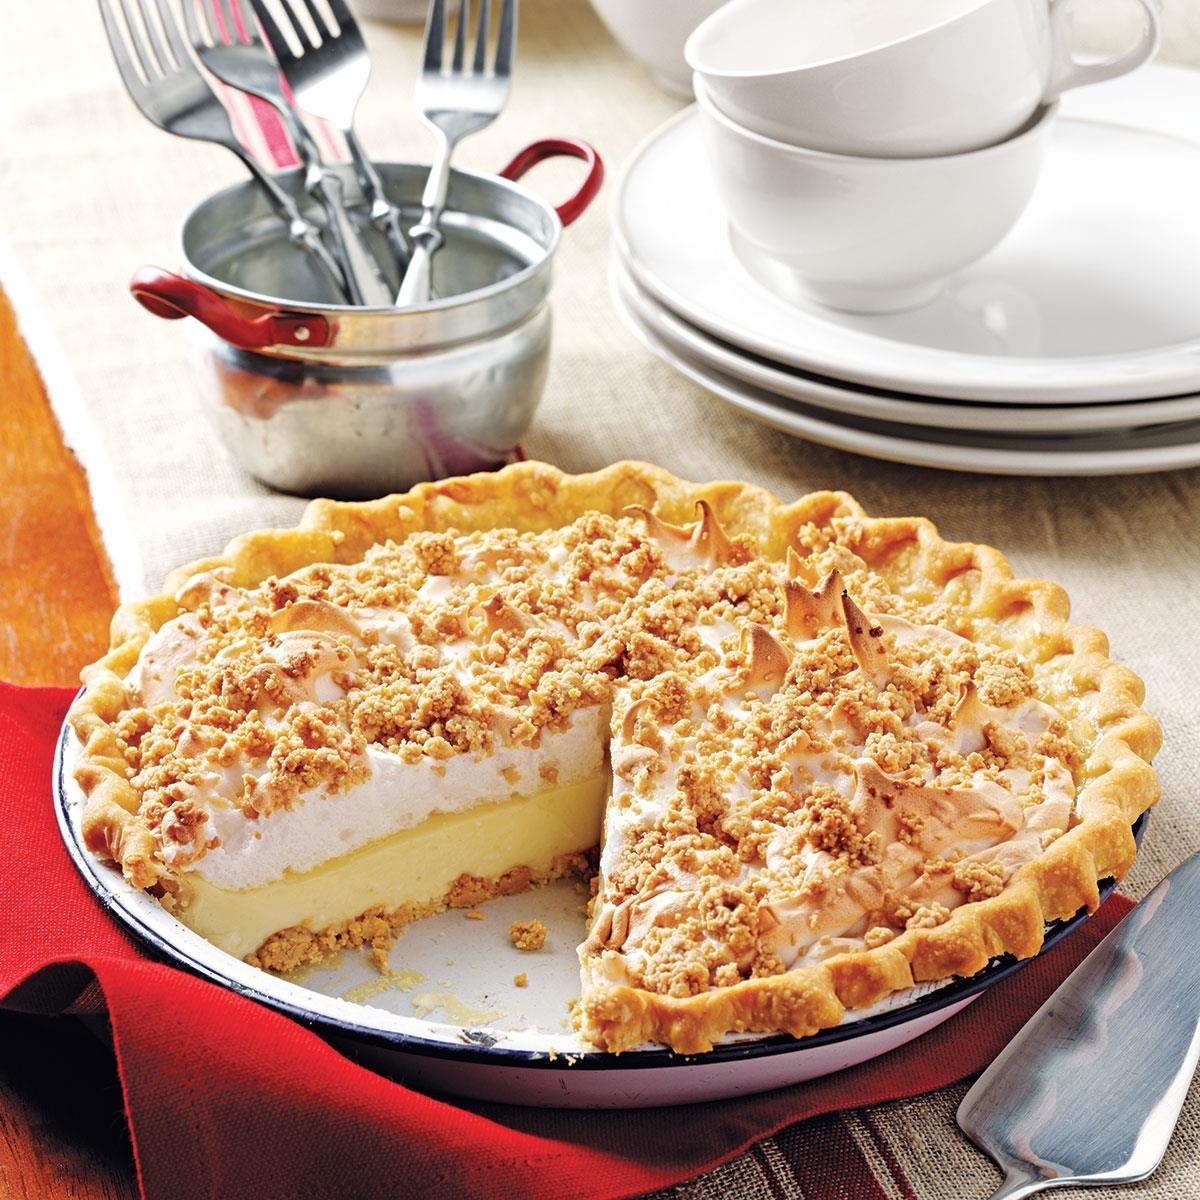 Superb Peanut Butter Meringue Pie Exps135214 Cw1996974b03 16 2bc Rms 1 Custard Pie Recipe Betty Crocker Custard Pie Recipes Food Network nice food Custard Pie Recipe